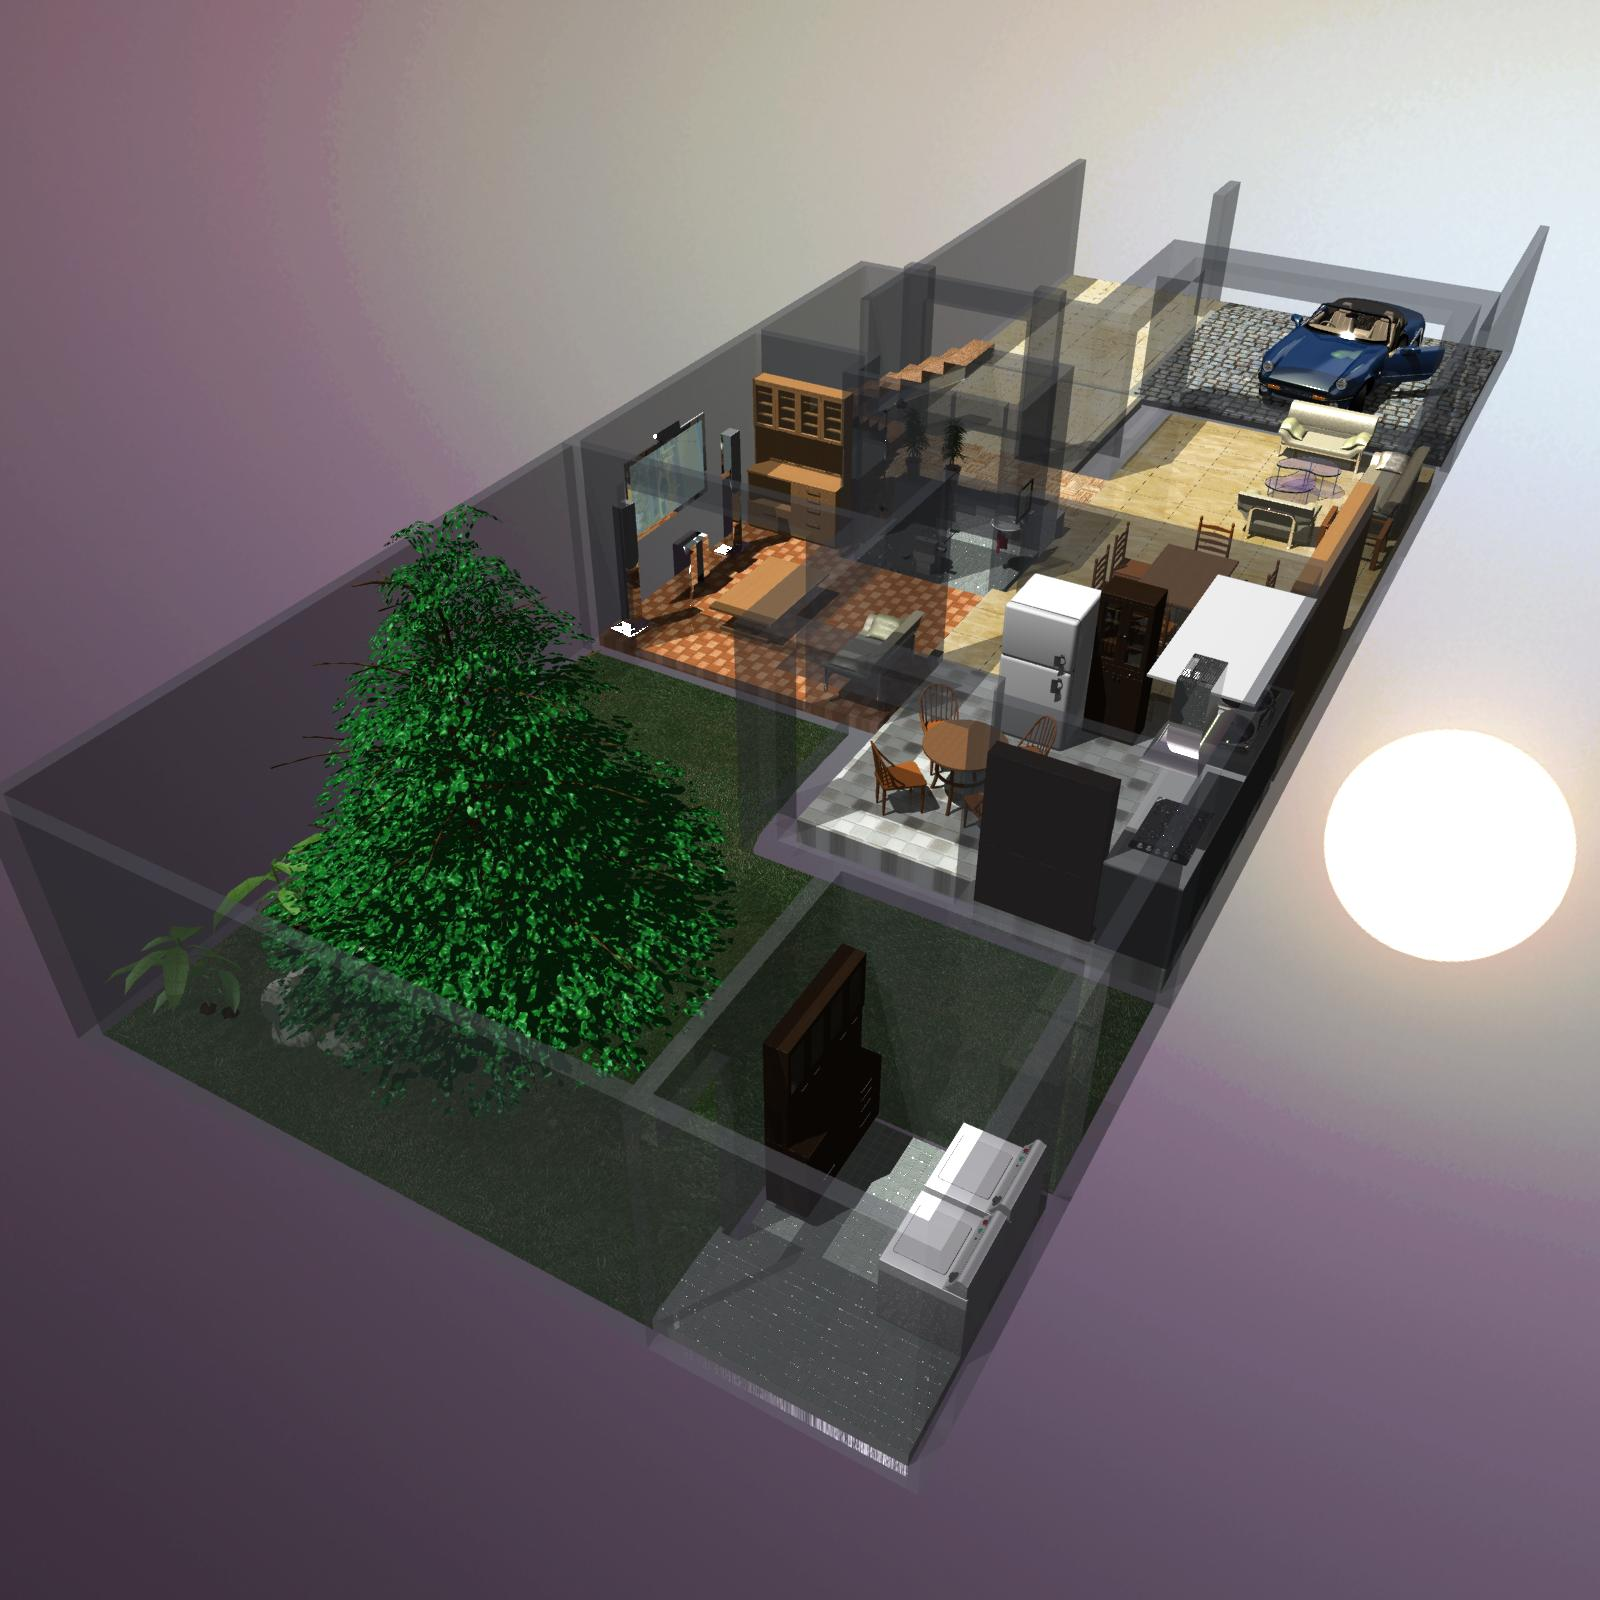 Residential interior, 2